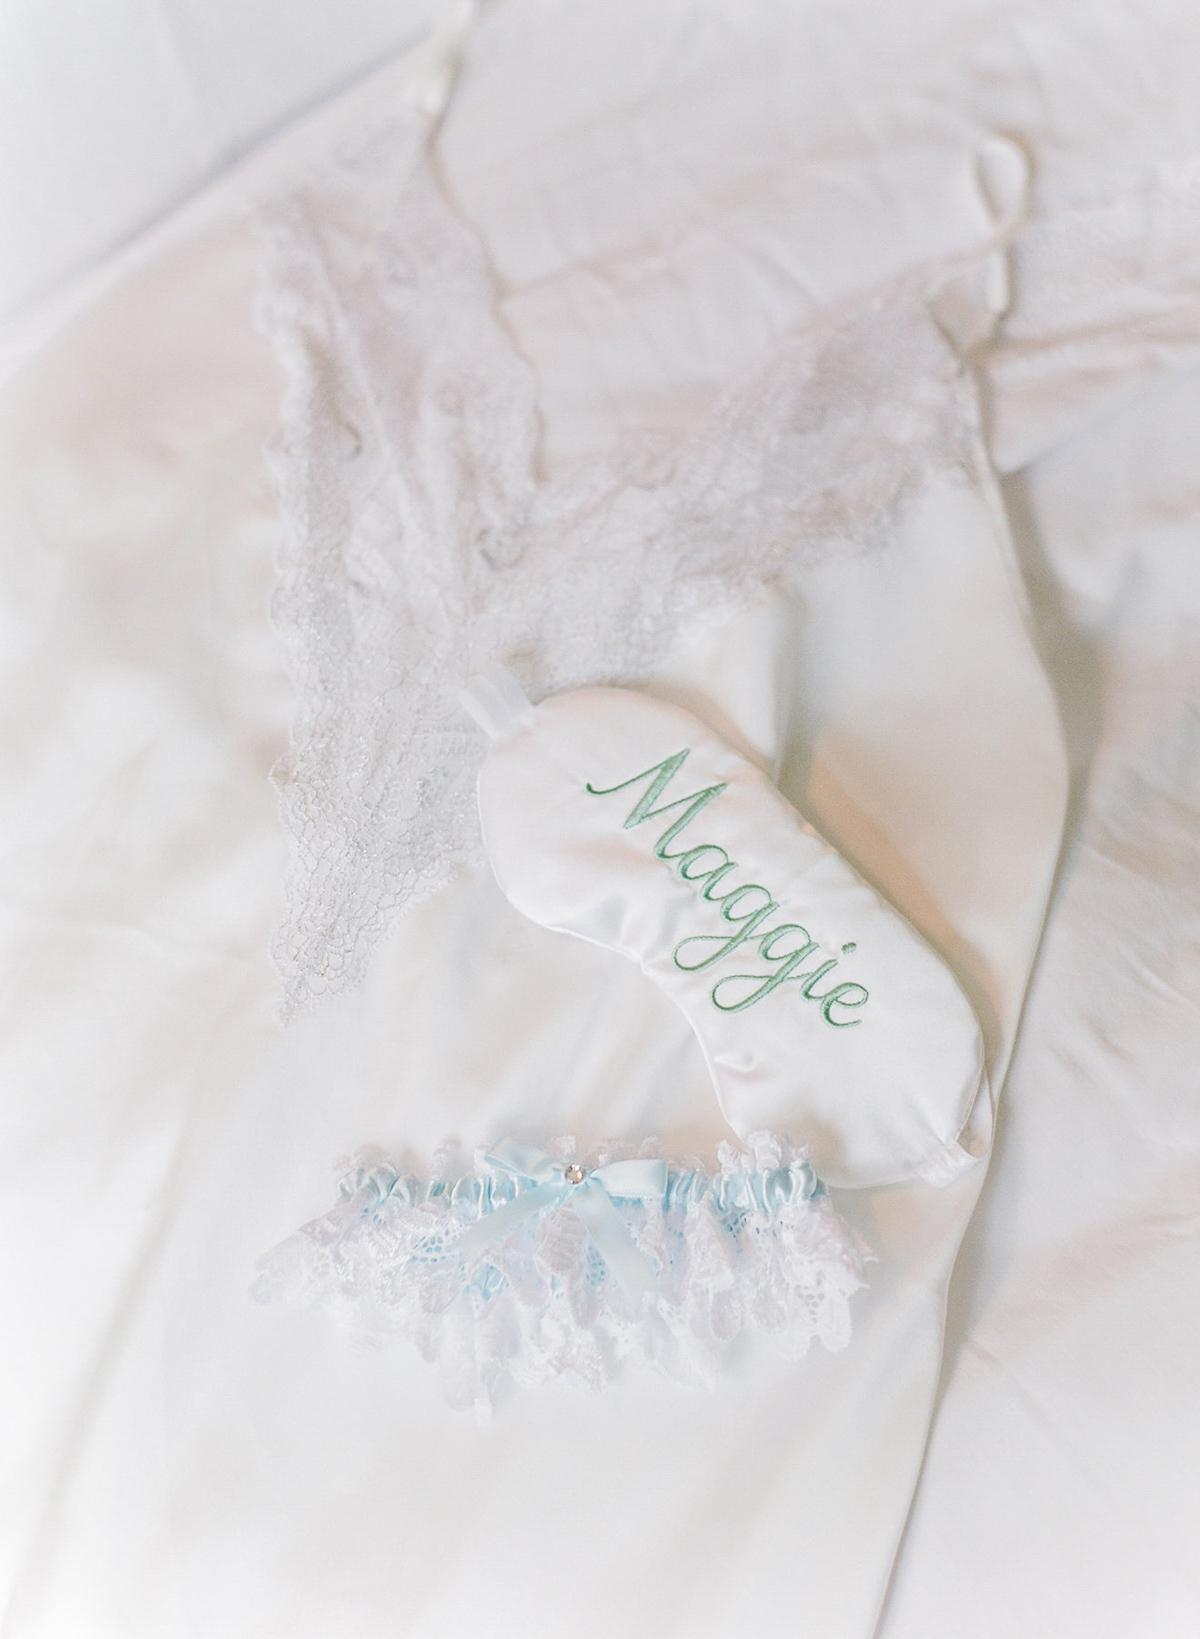 artiese-studios-vineyard-bride-swish-list-private-estate-cambridge-wedding-70.jpg